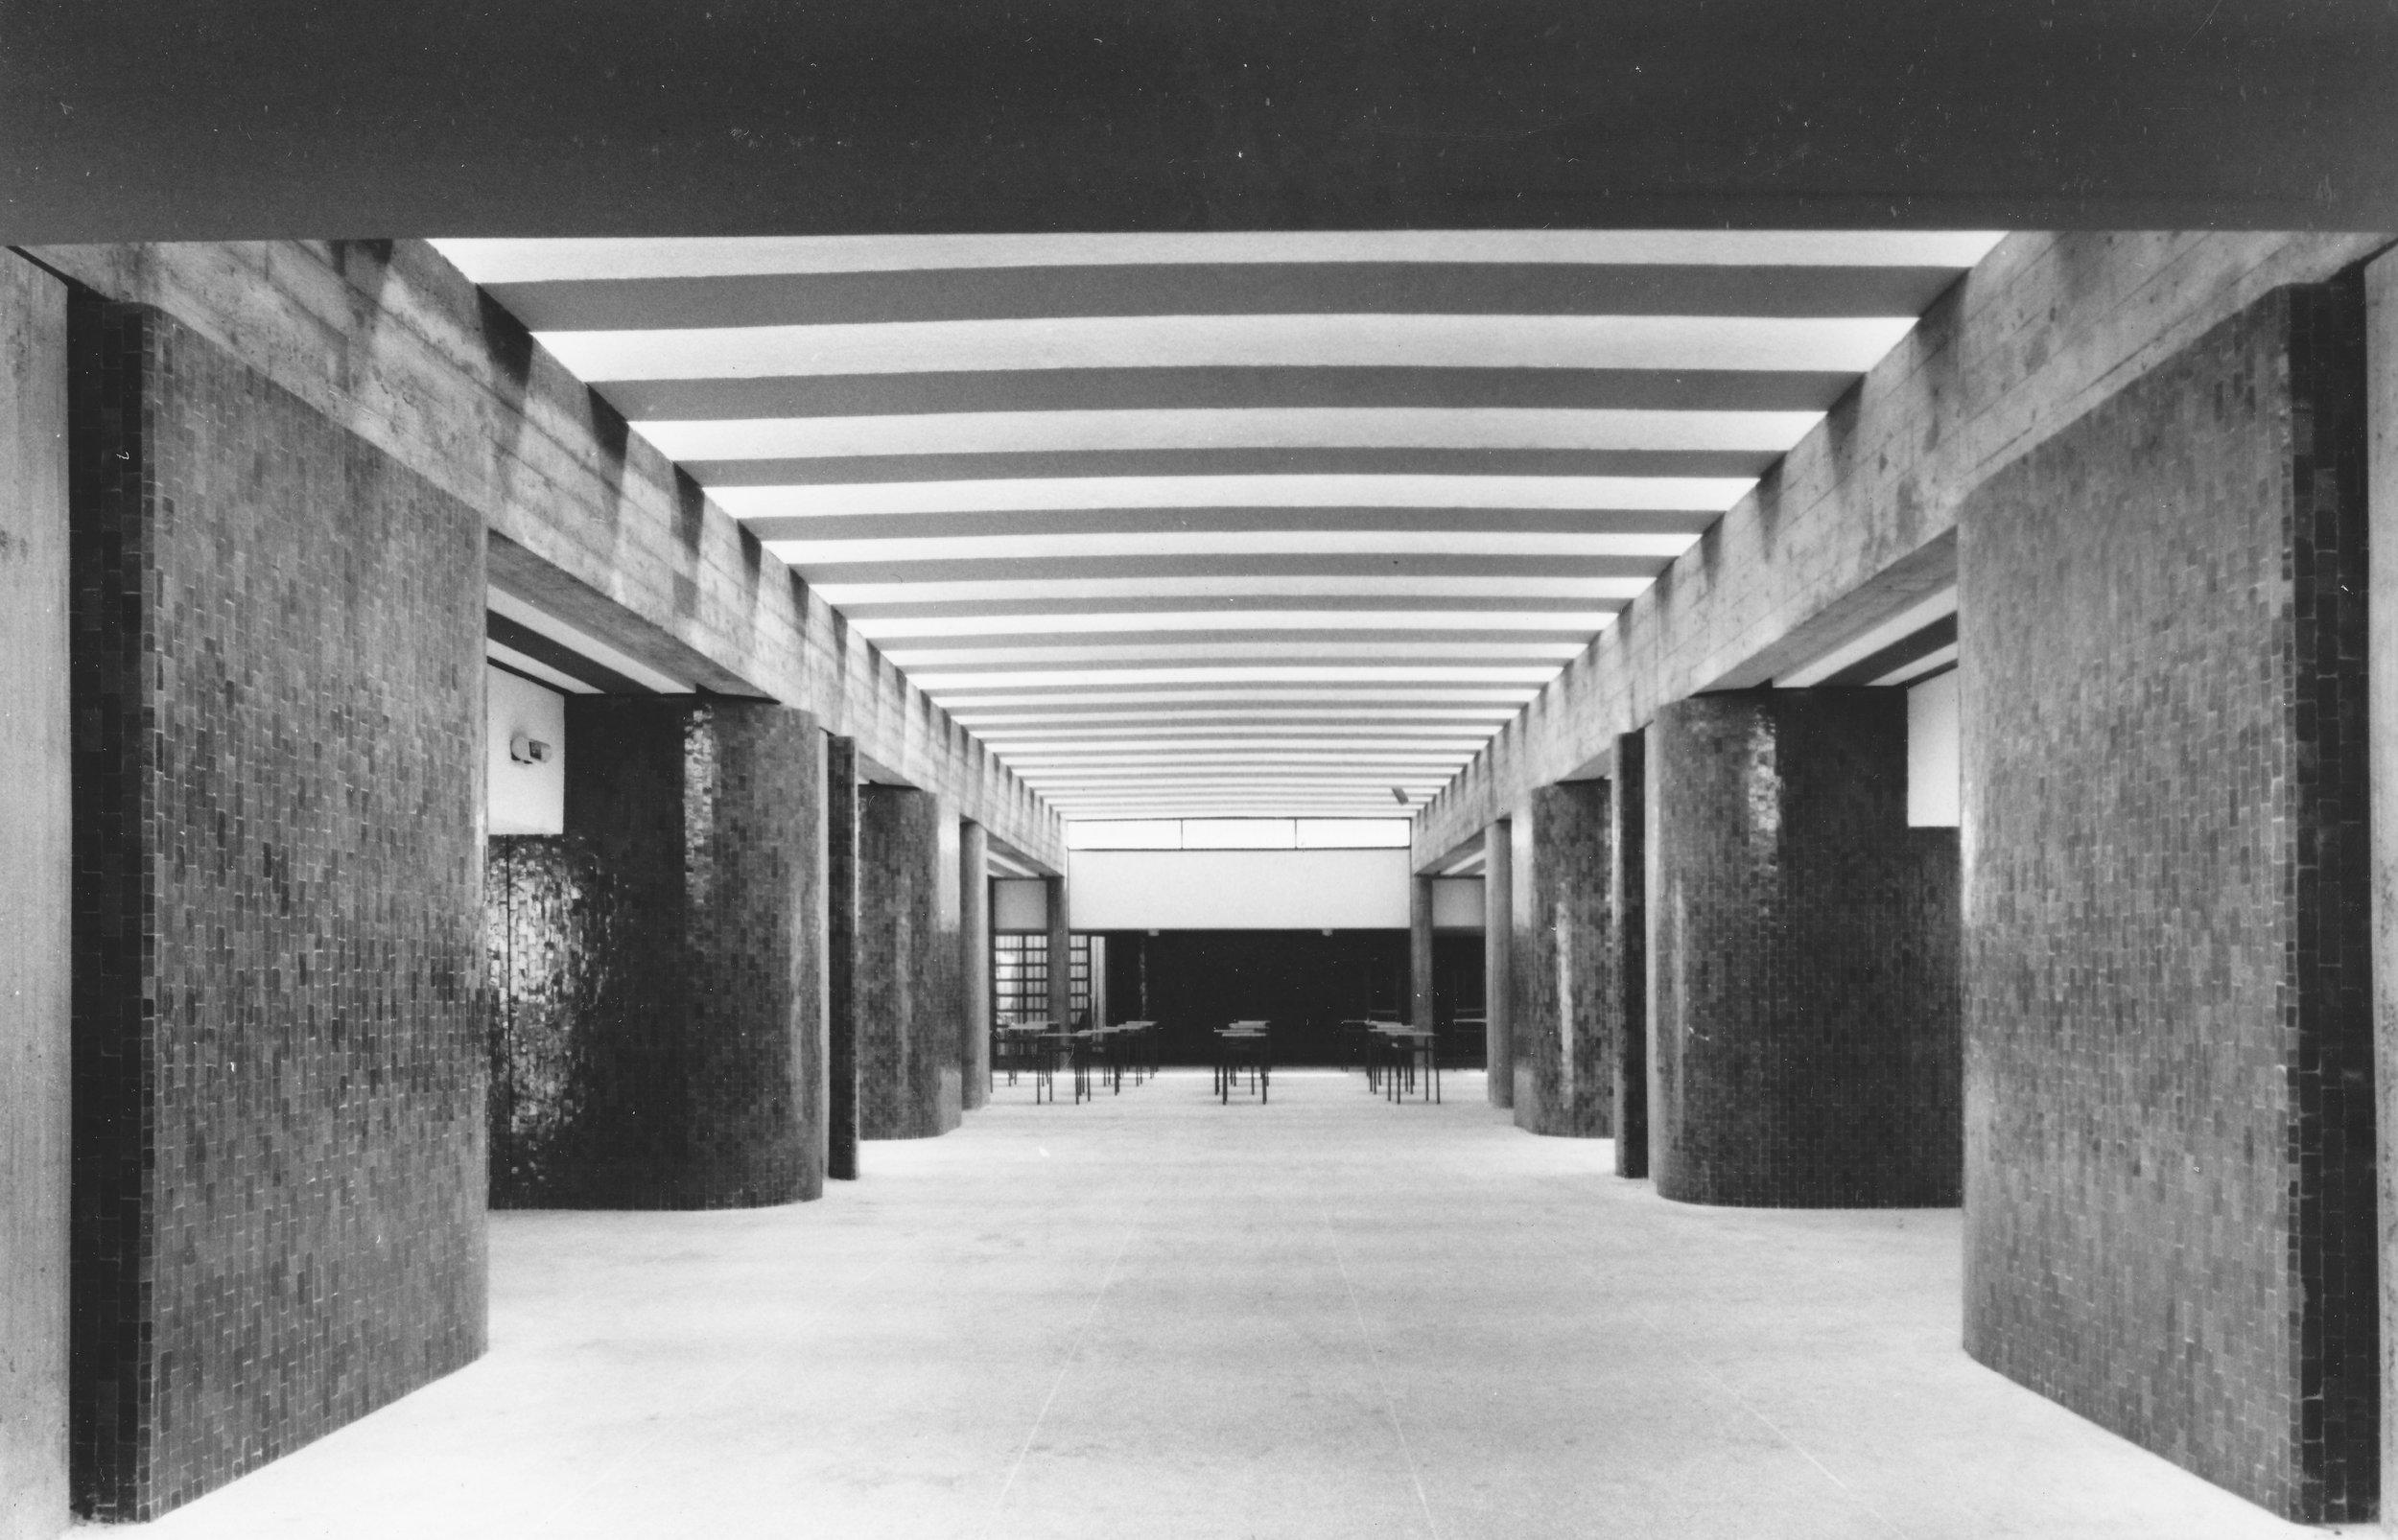 © Courtesy of the Architect -Agence FARAOUI-DE MAZIERES